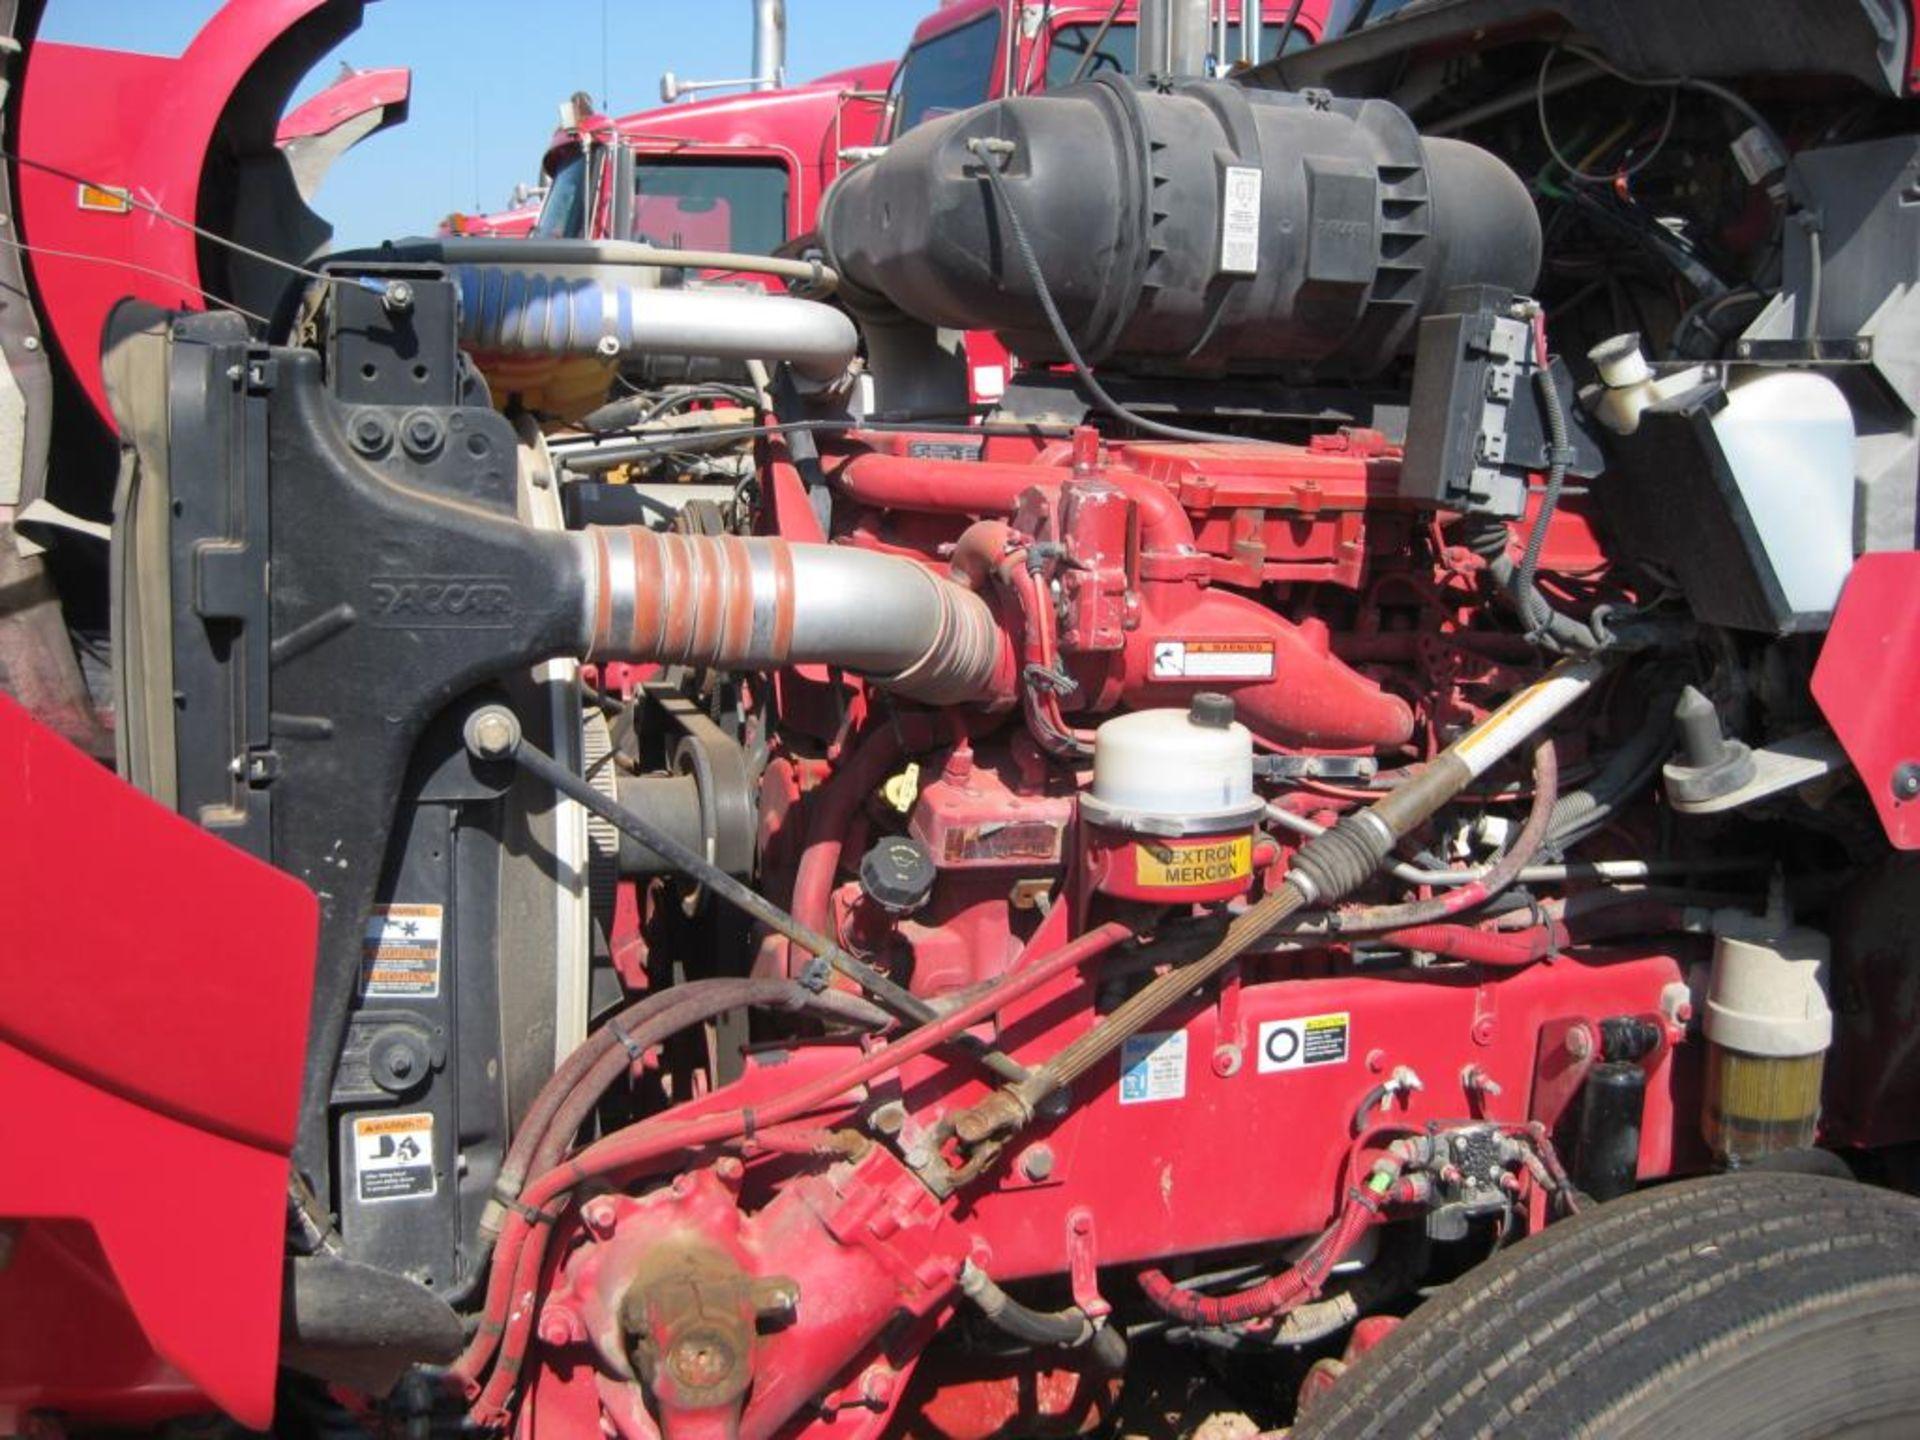 Kenworth Winch Truck - Image 22 of 25